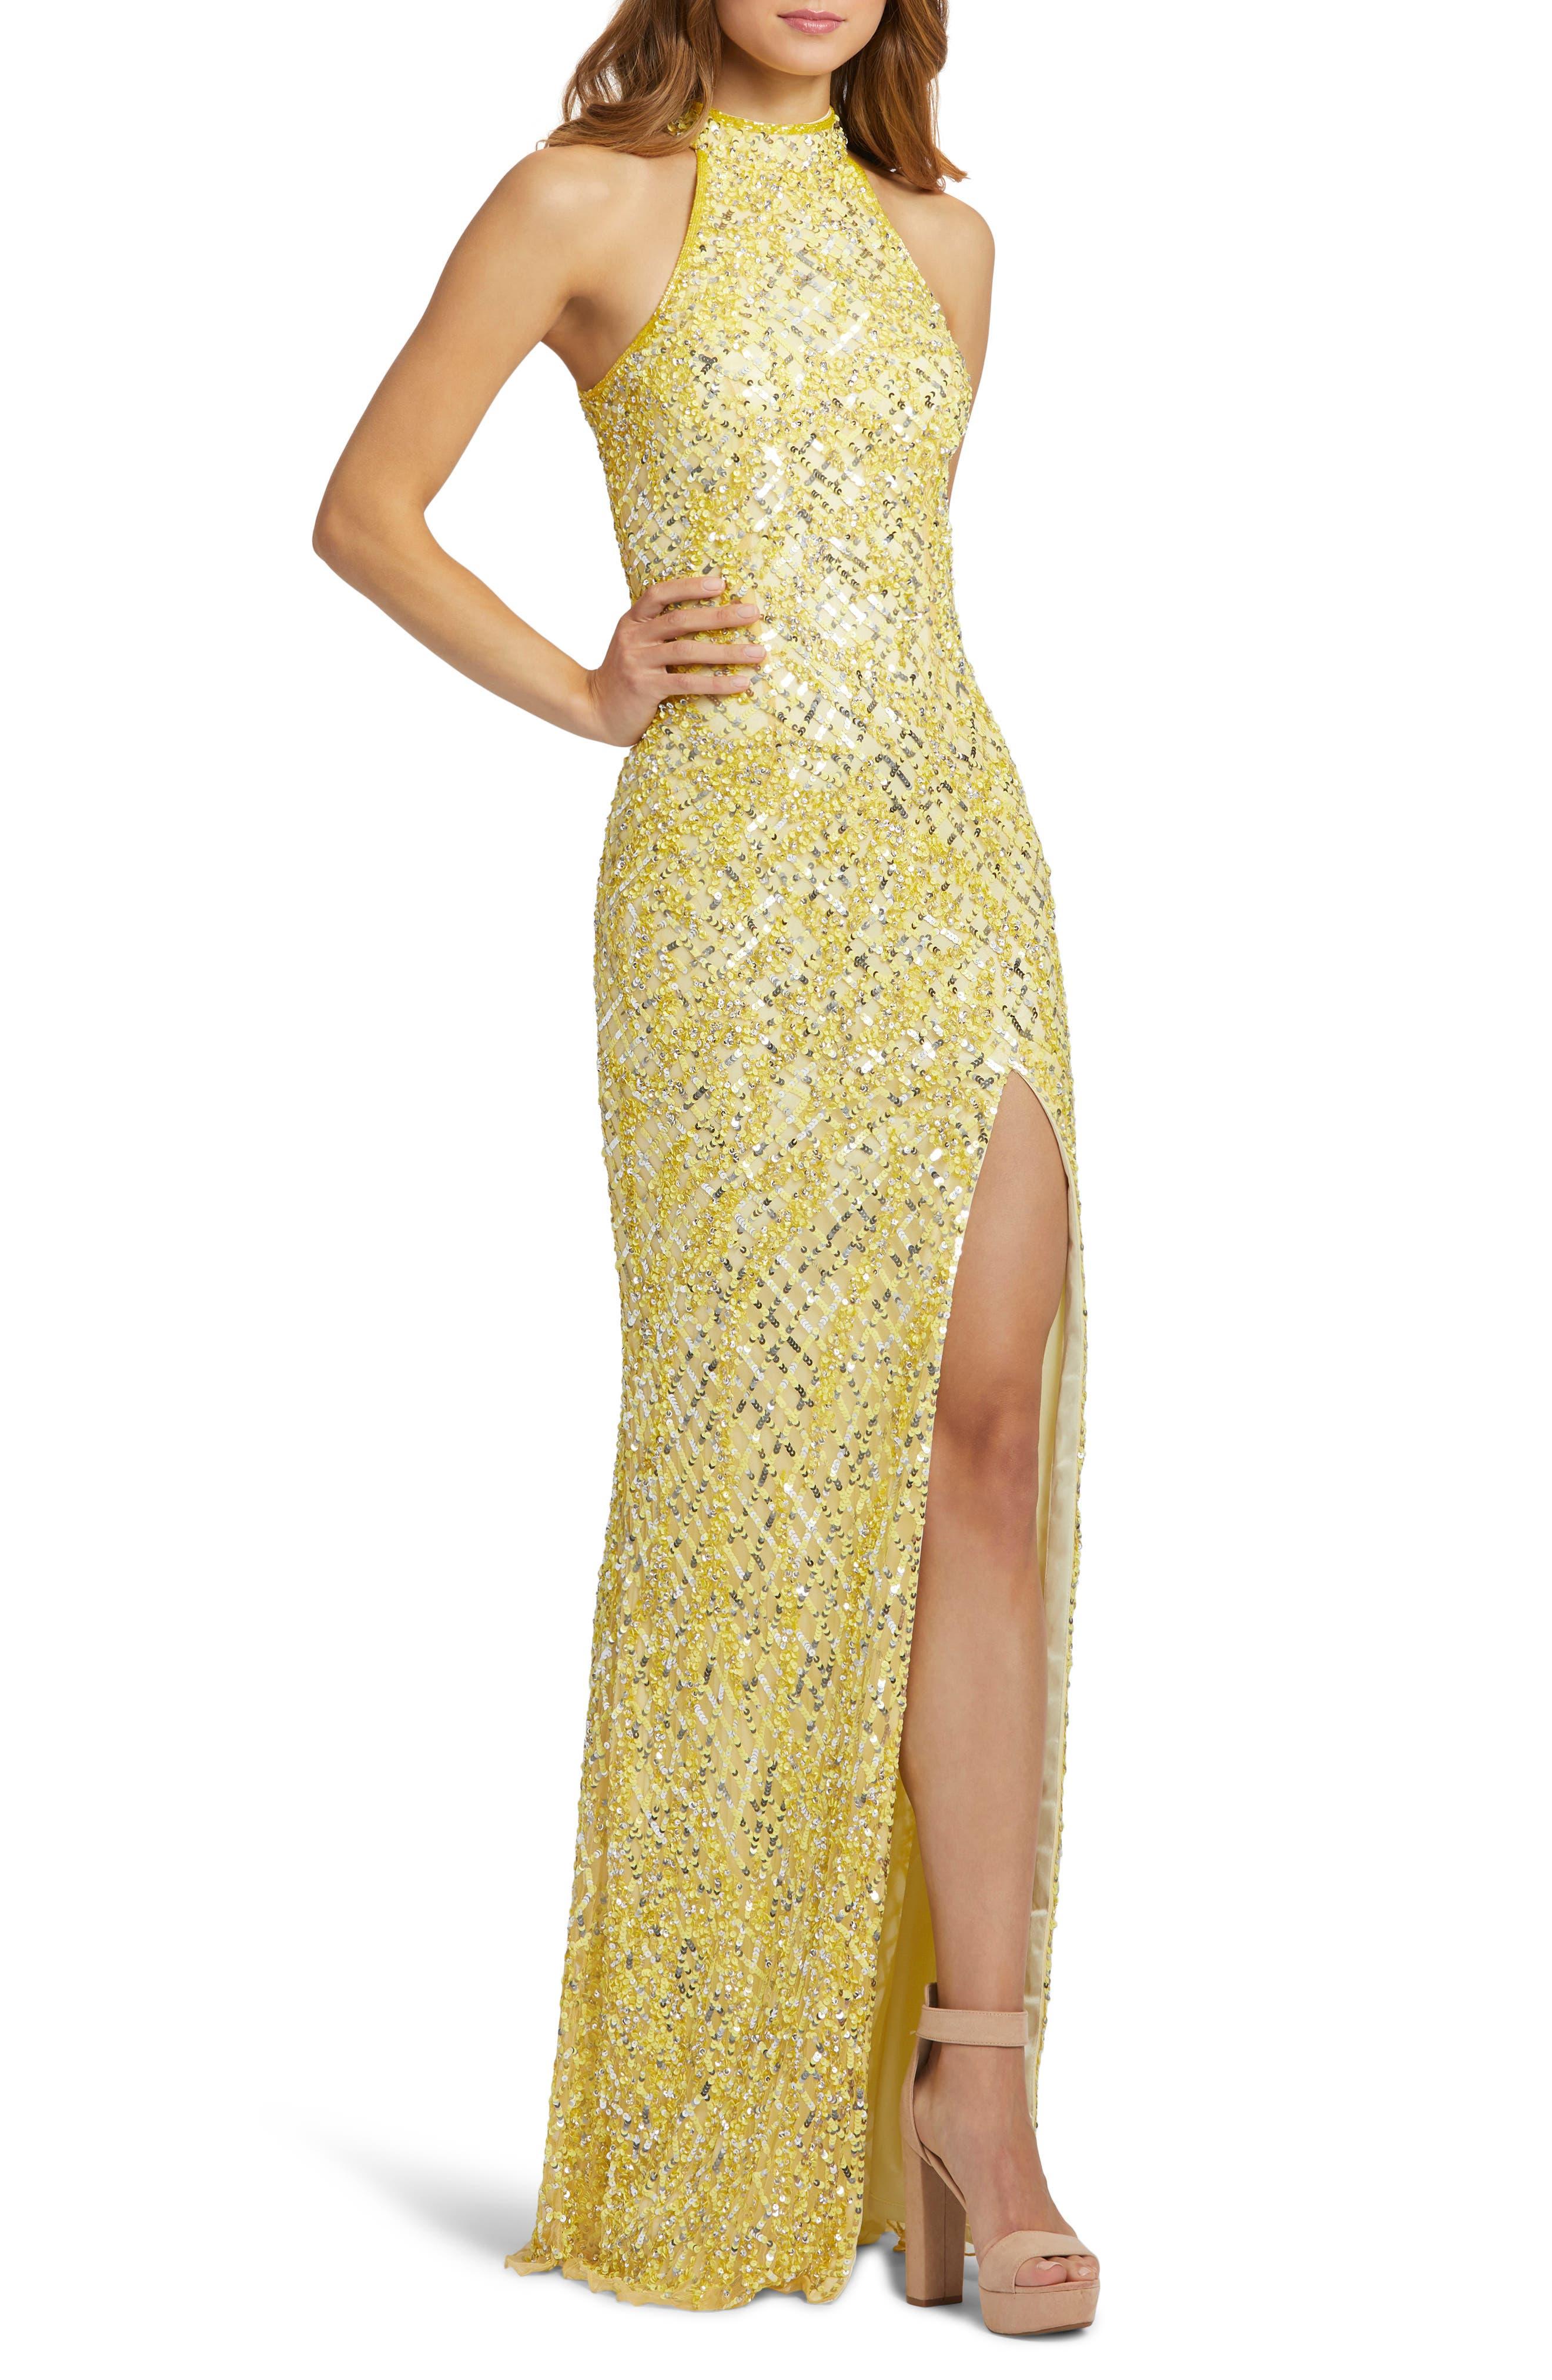 70s Dresses – Disco Dress, Hippie Dress, Wrap Dress Womens MAC Duggal Embellished Halter Column Gown Size 0 - Yellow $338.00 AT vintagedancer.com